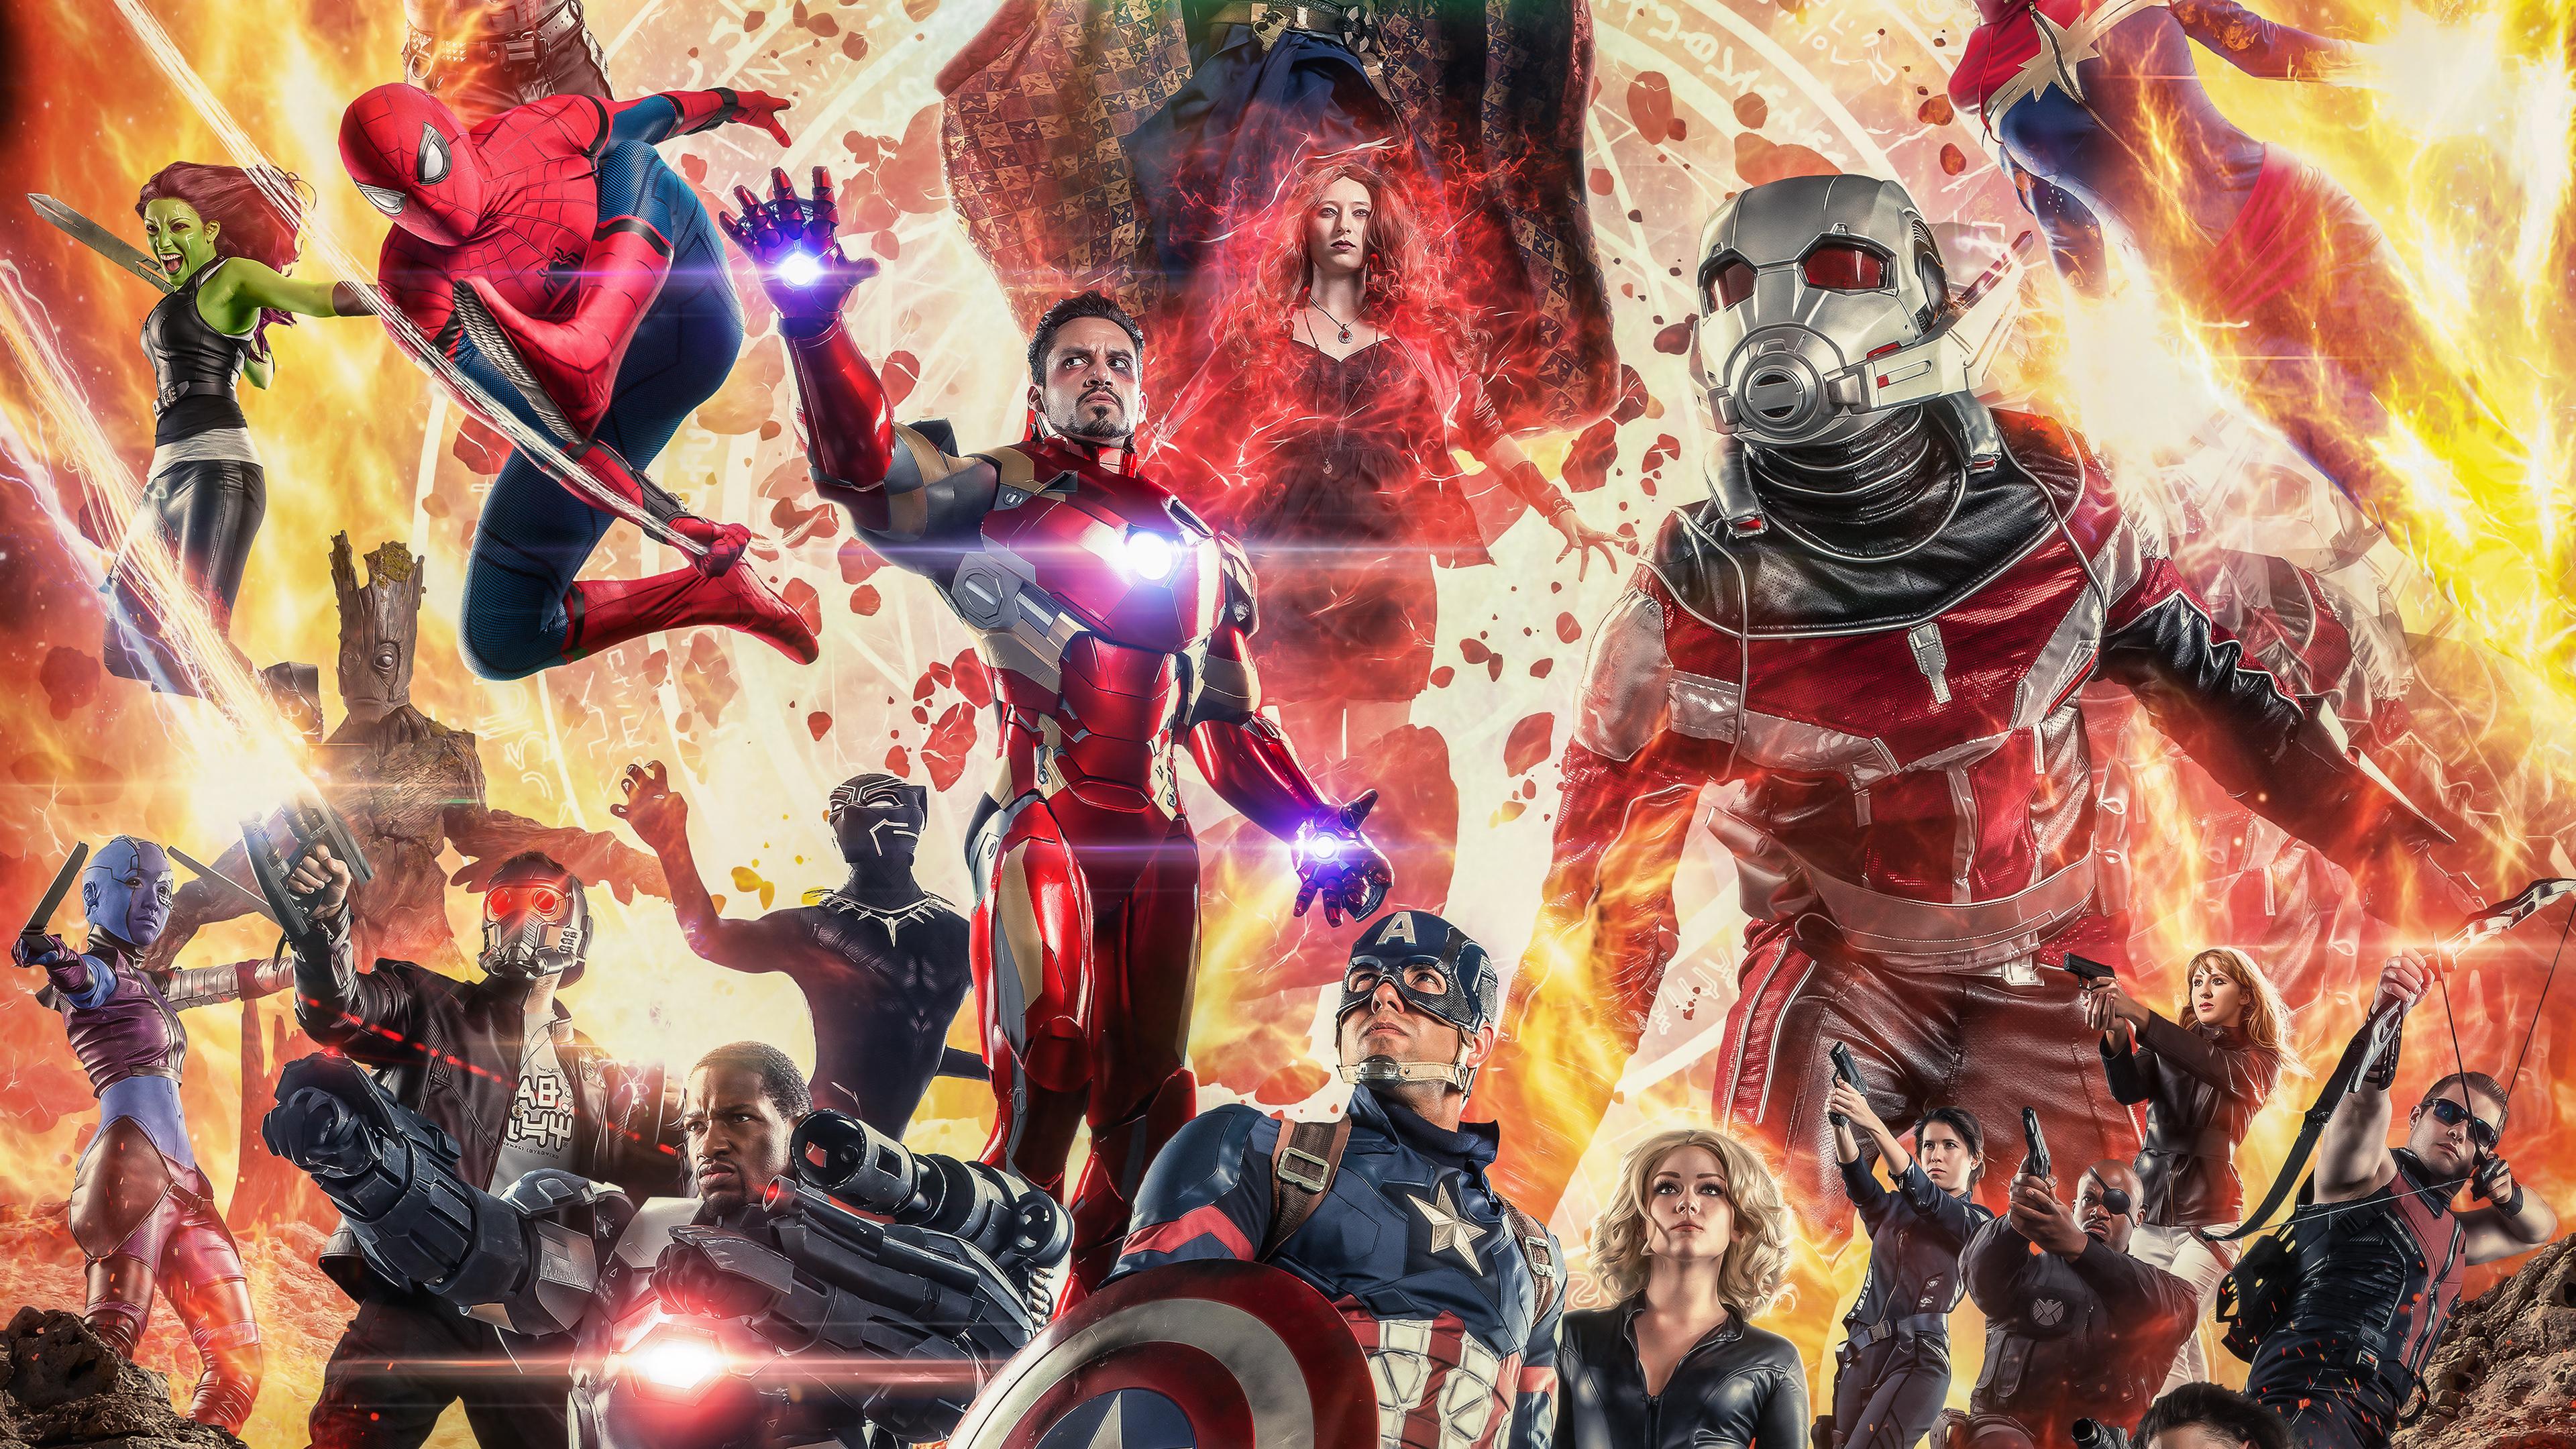 avengers infinity war cosplay 4k 1544923028 - Avengers Infinity War Cosplay 4k - movies wallpapers, hd-wallpapers, behance wallpapers, avengers-infinity-war-wallpapers, artist wallpapers, 4k-wallpapers, 2018-movies-wallpapers